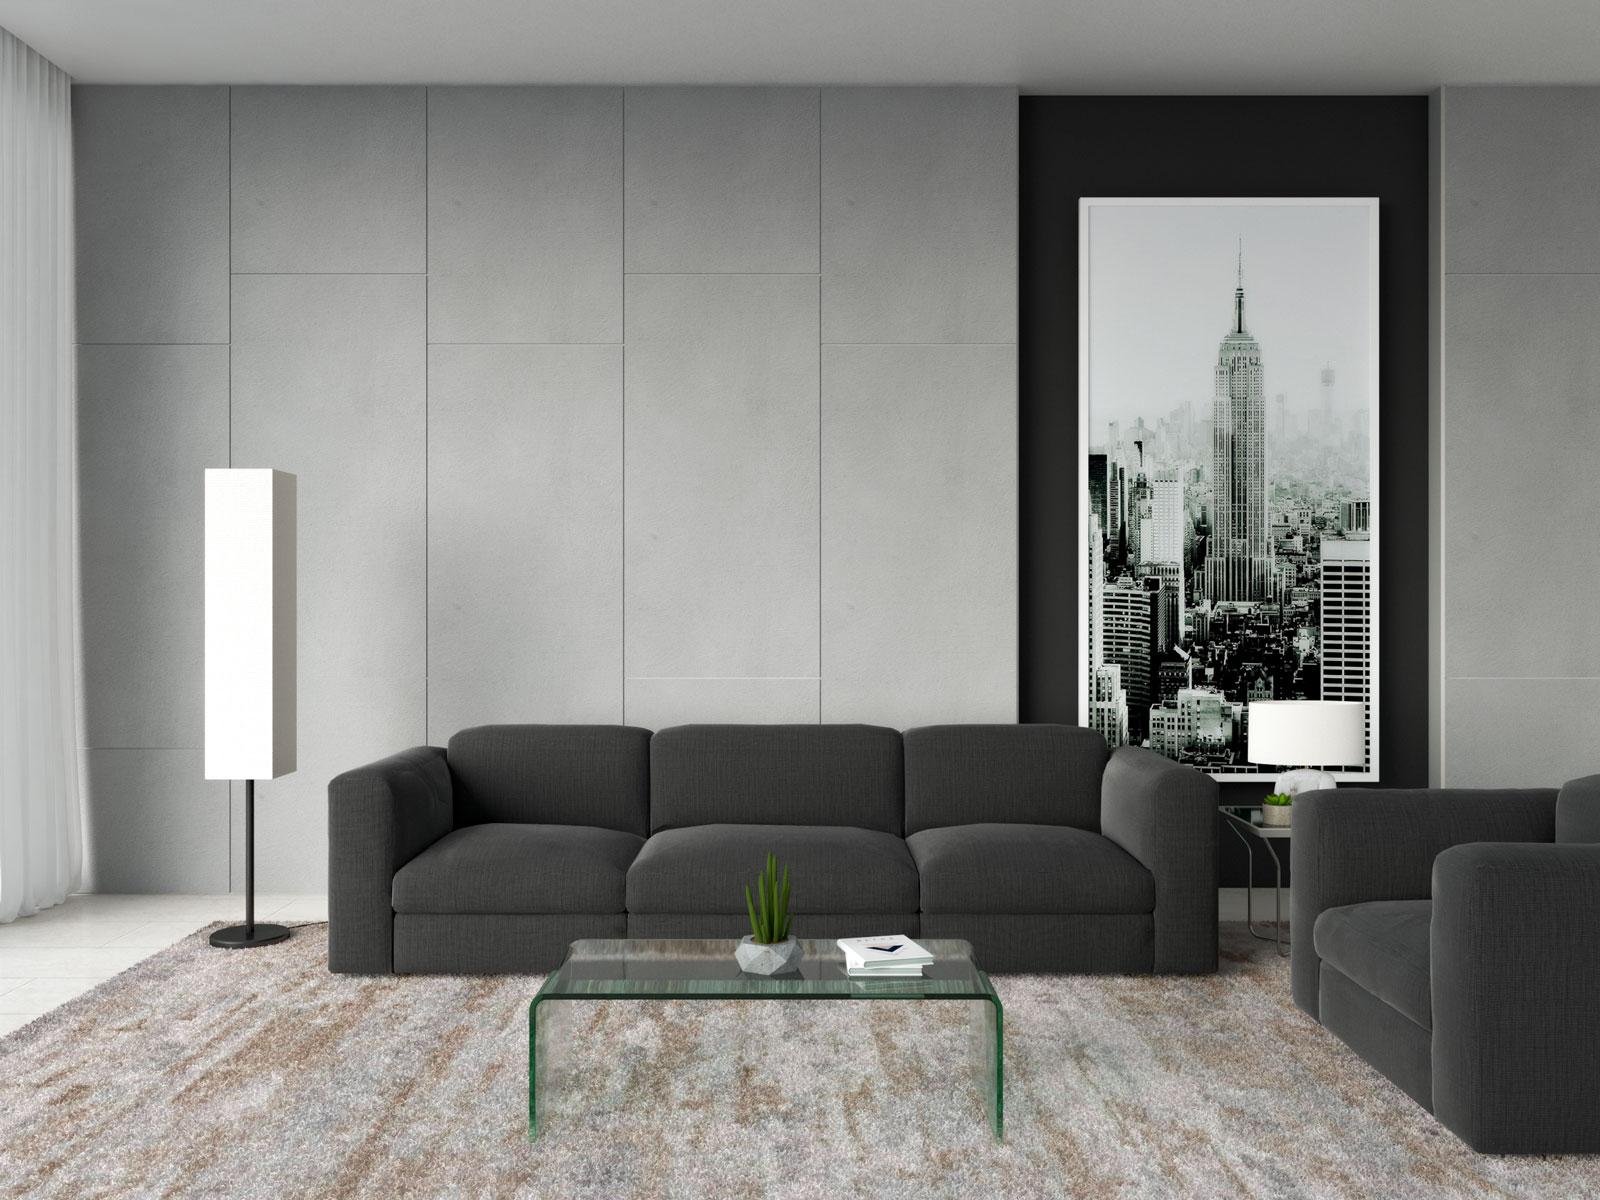 Glass coffee table with black sofa